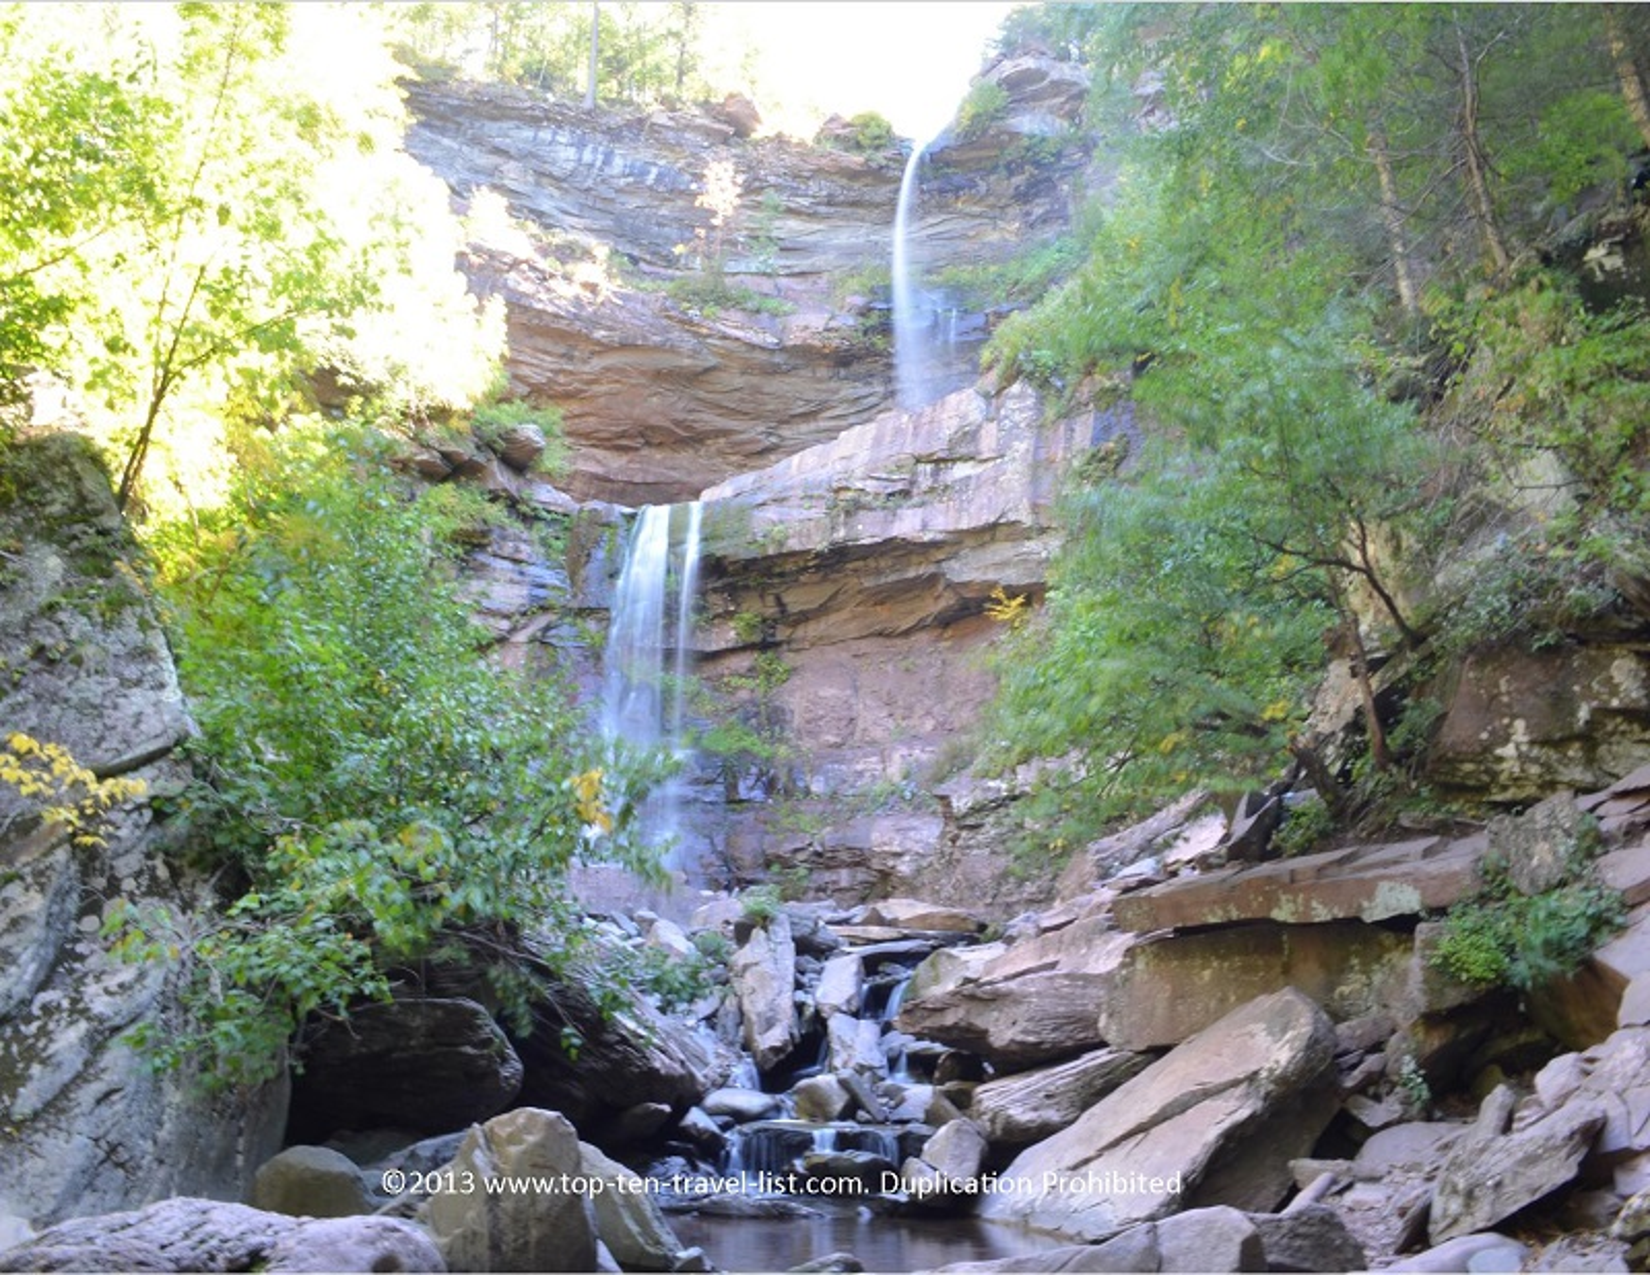 Hike to Kaaterskill Falls